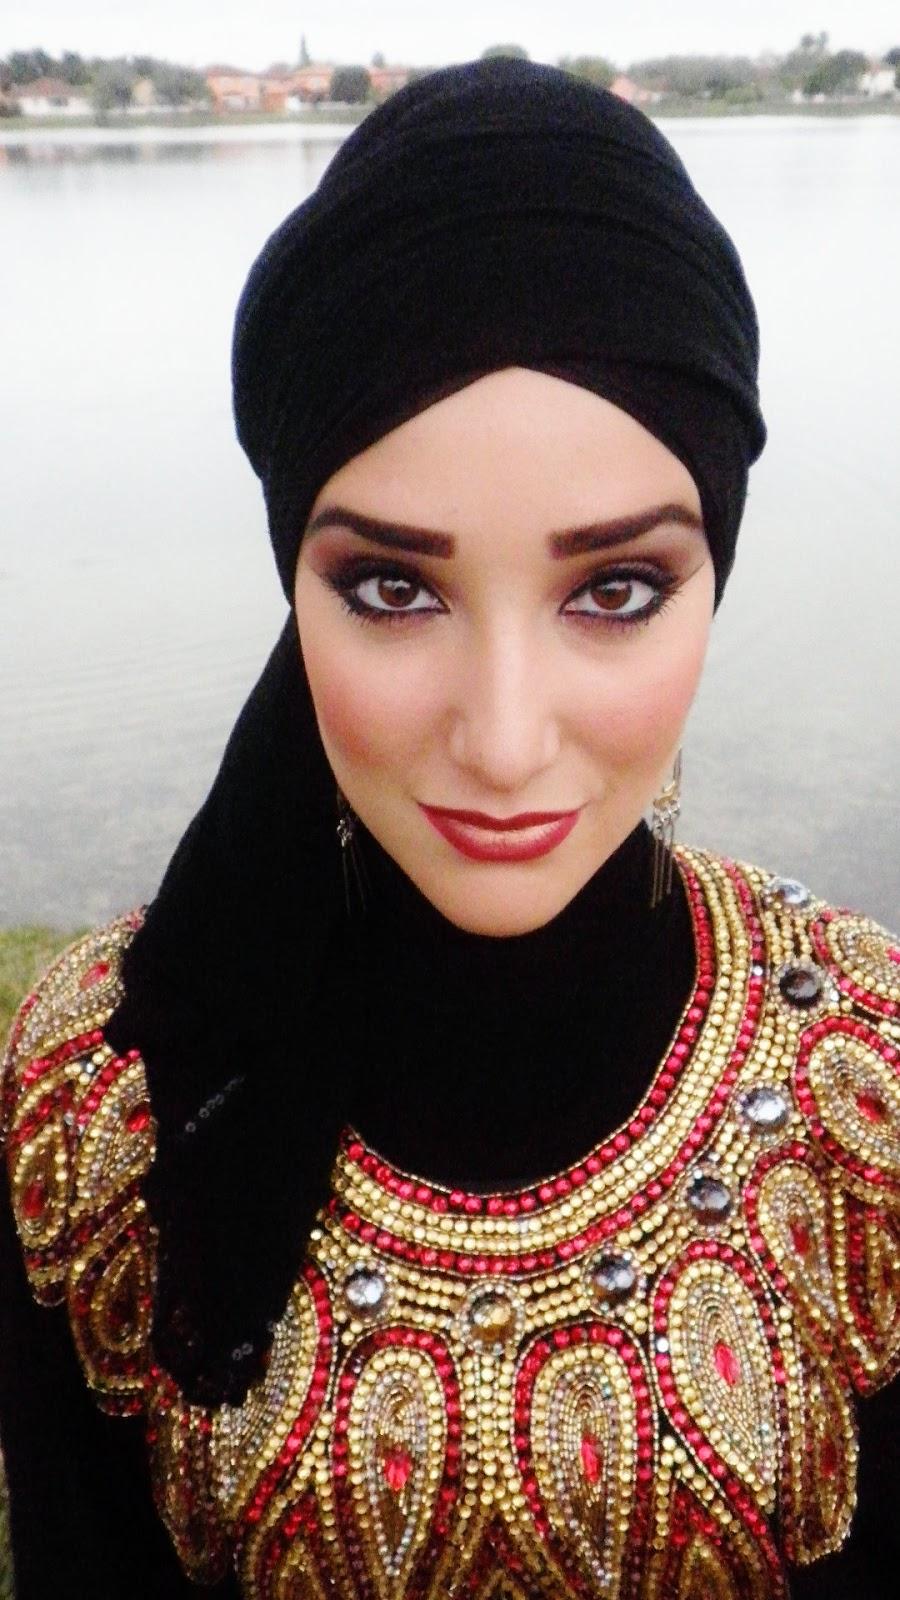 Wajah oval cocok semua gaya hijab dan gaya turban adalah pilihan yang  sangat baik. Jika Anda mencari untuk membuat wajah anda terlihat lebih  kecil atau ... 5e126a1e5c